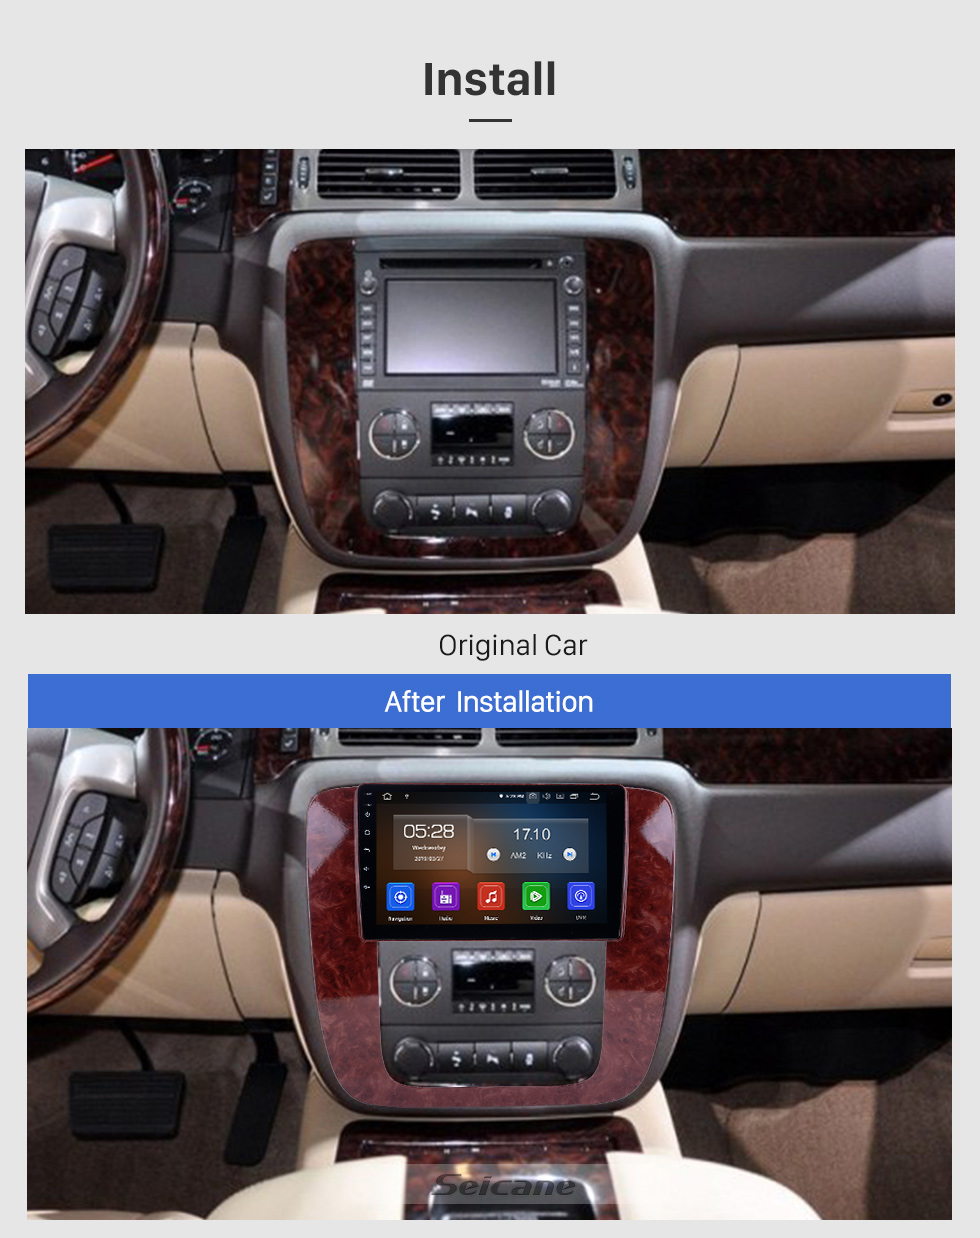 Seicane Android 9.0 9 Zoll GPS Navigationsradio für 2007-2012 GMC Yukon / Acadia / Tahoe Chevy Chevrolet Tahoe / Suburban Buick Enklave mit HD Touchscreen Carplay Bluetooth Unterstützung OBD2